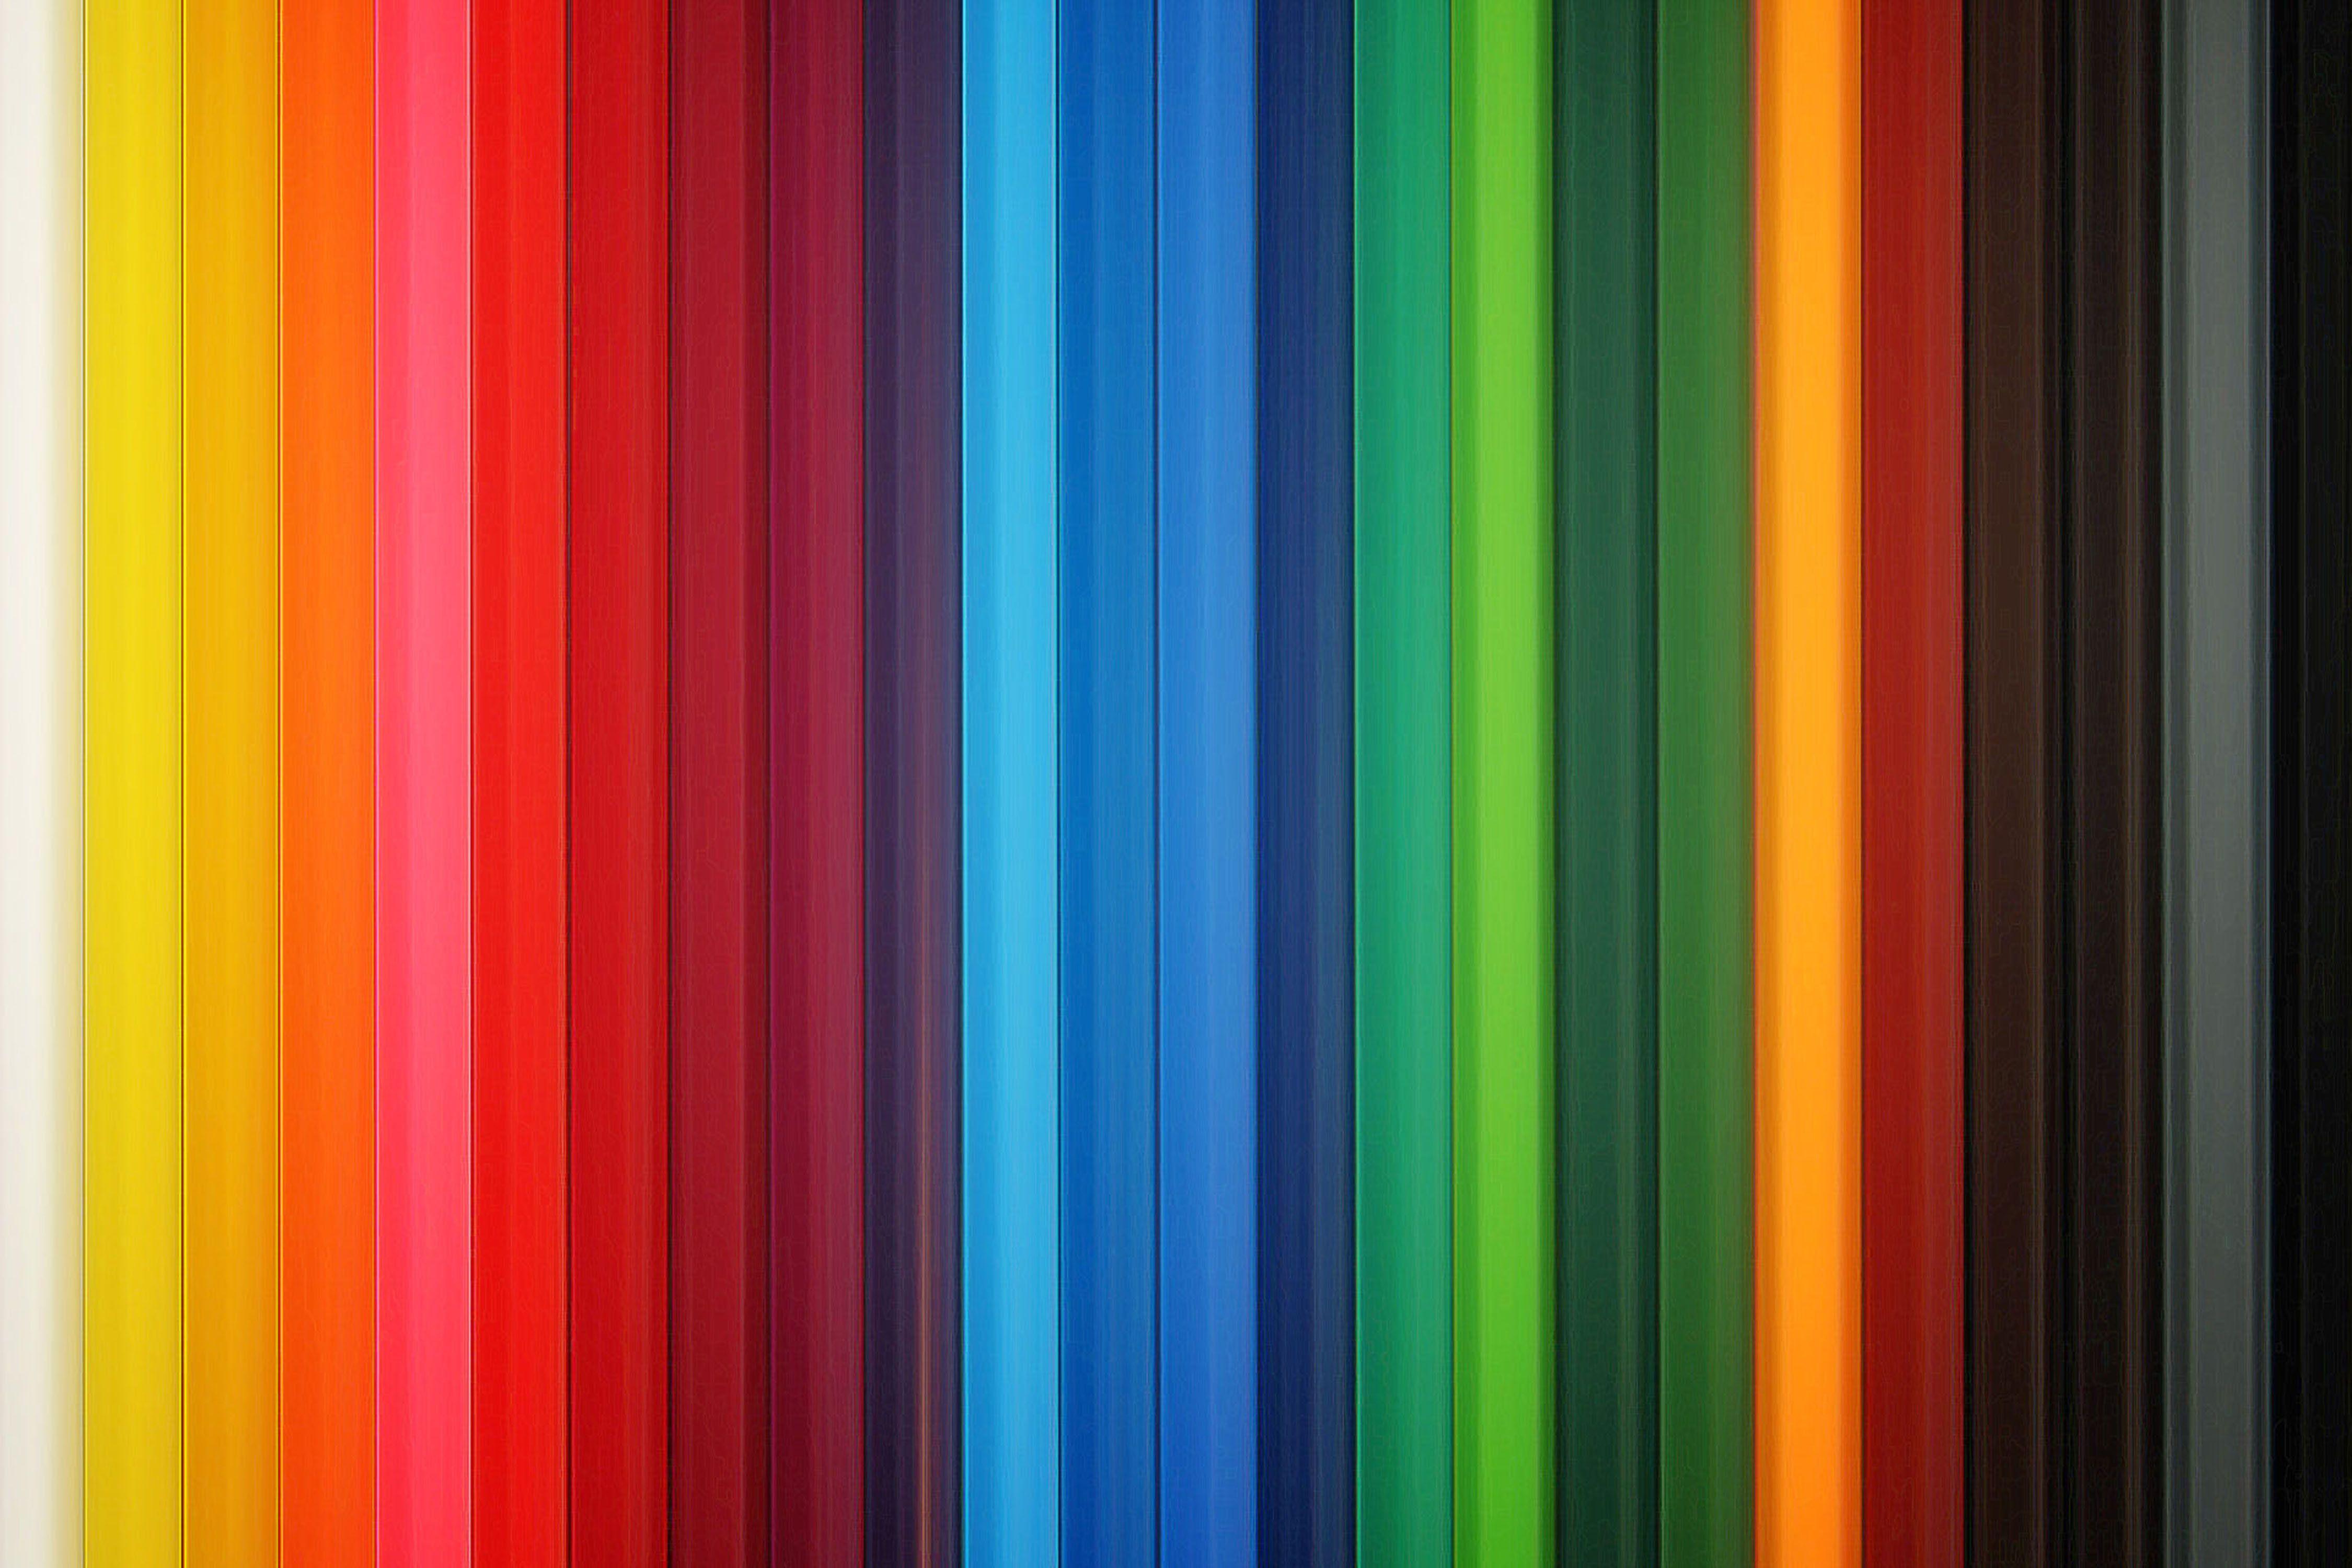 colors - Pesquisa Google